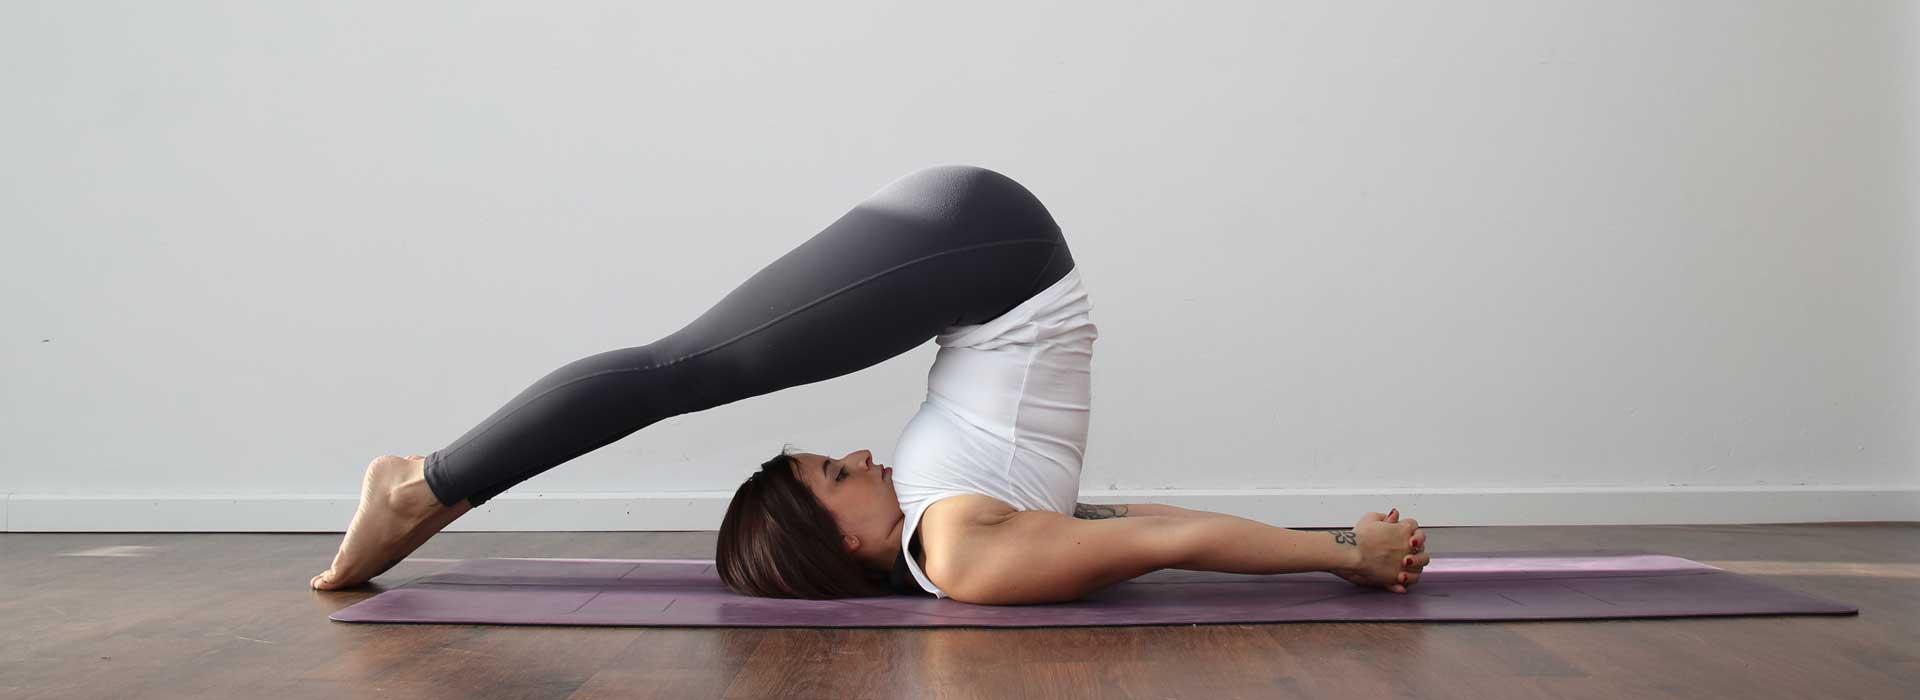 Sada Yoga classes